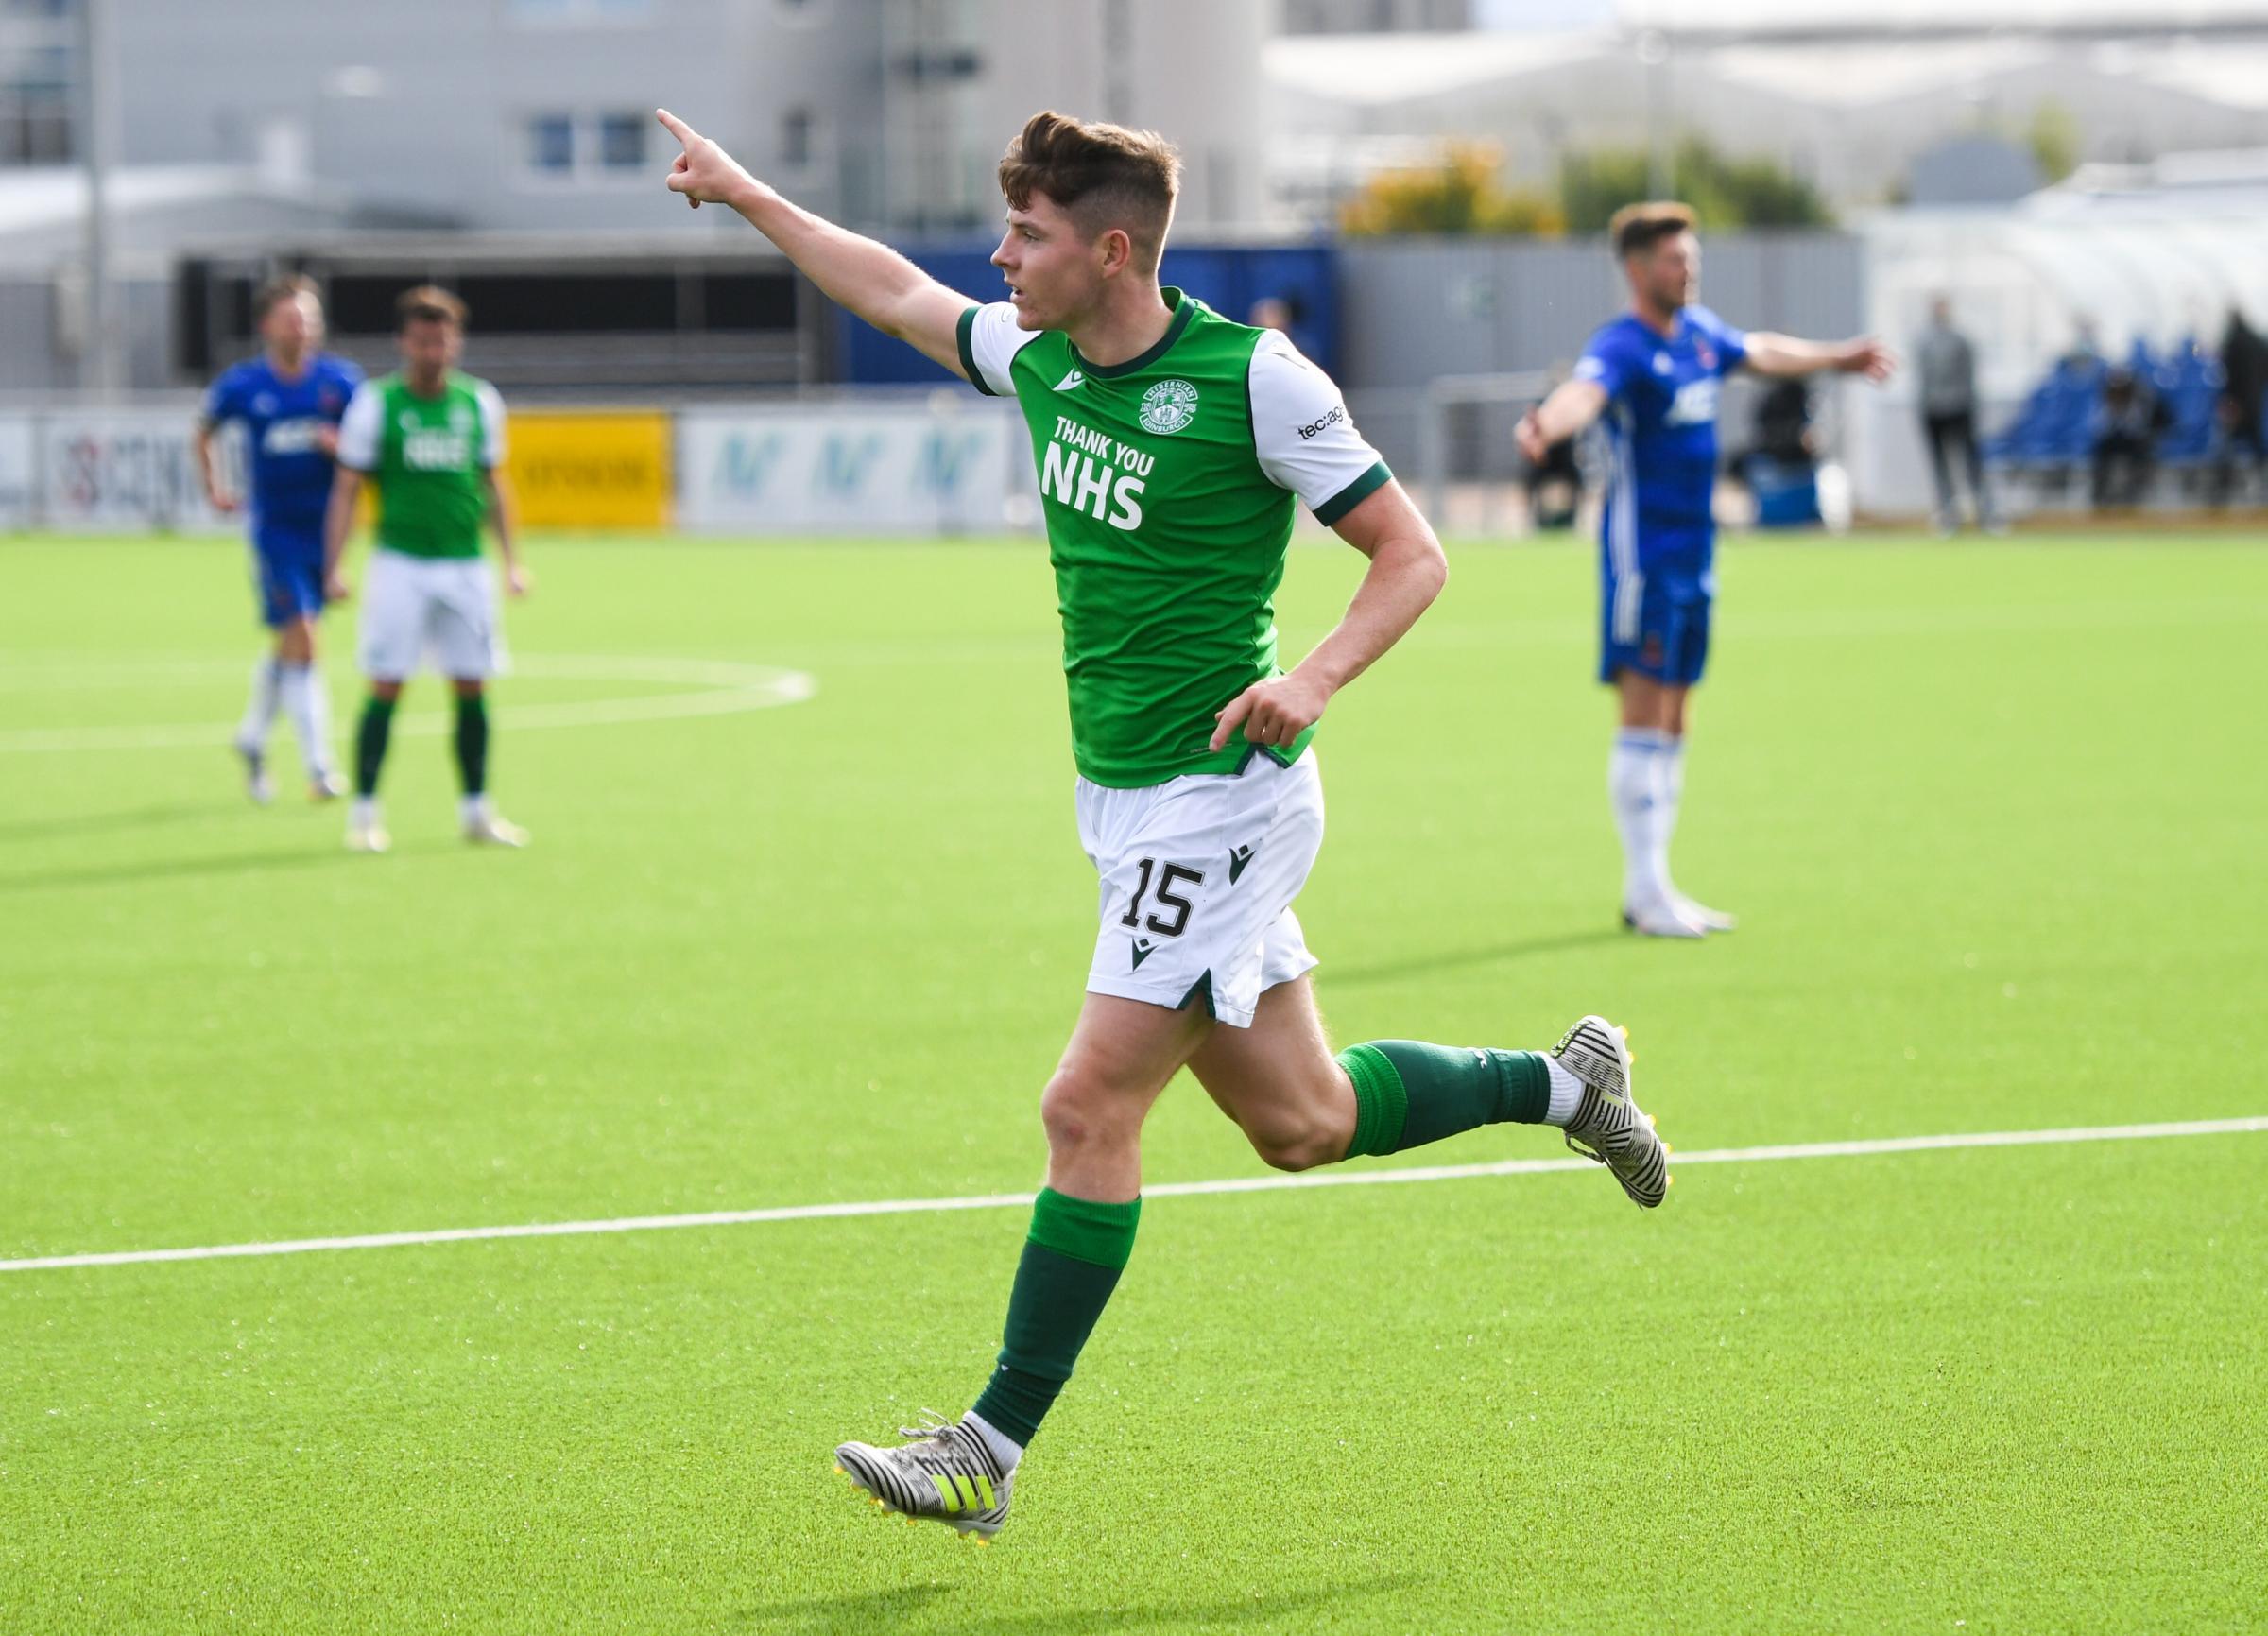 Hibs' Kevin Nisbet sets sights on Scotland cap